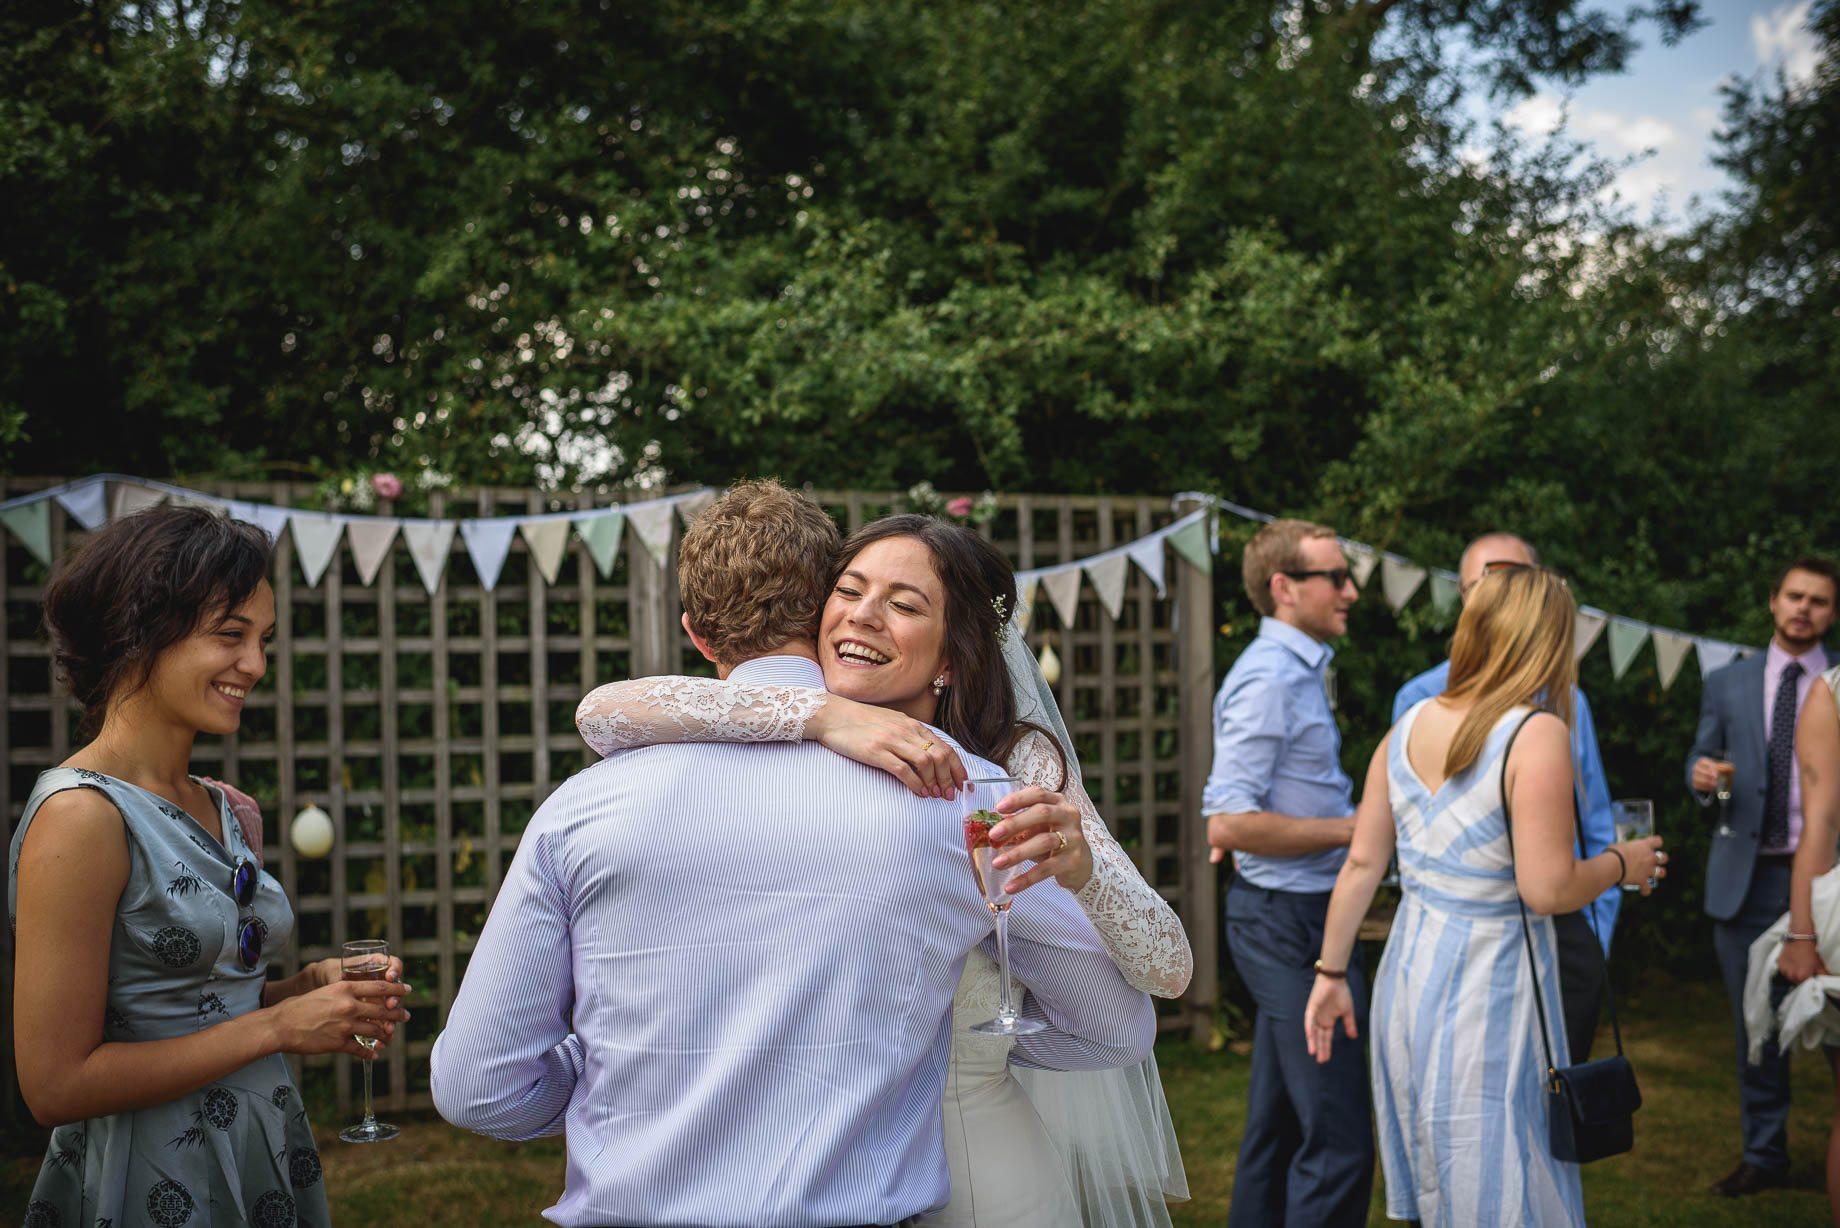 Gildings Barn wedding photography - Sarah and Steve (96 of 190)